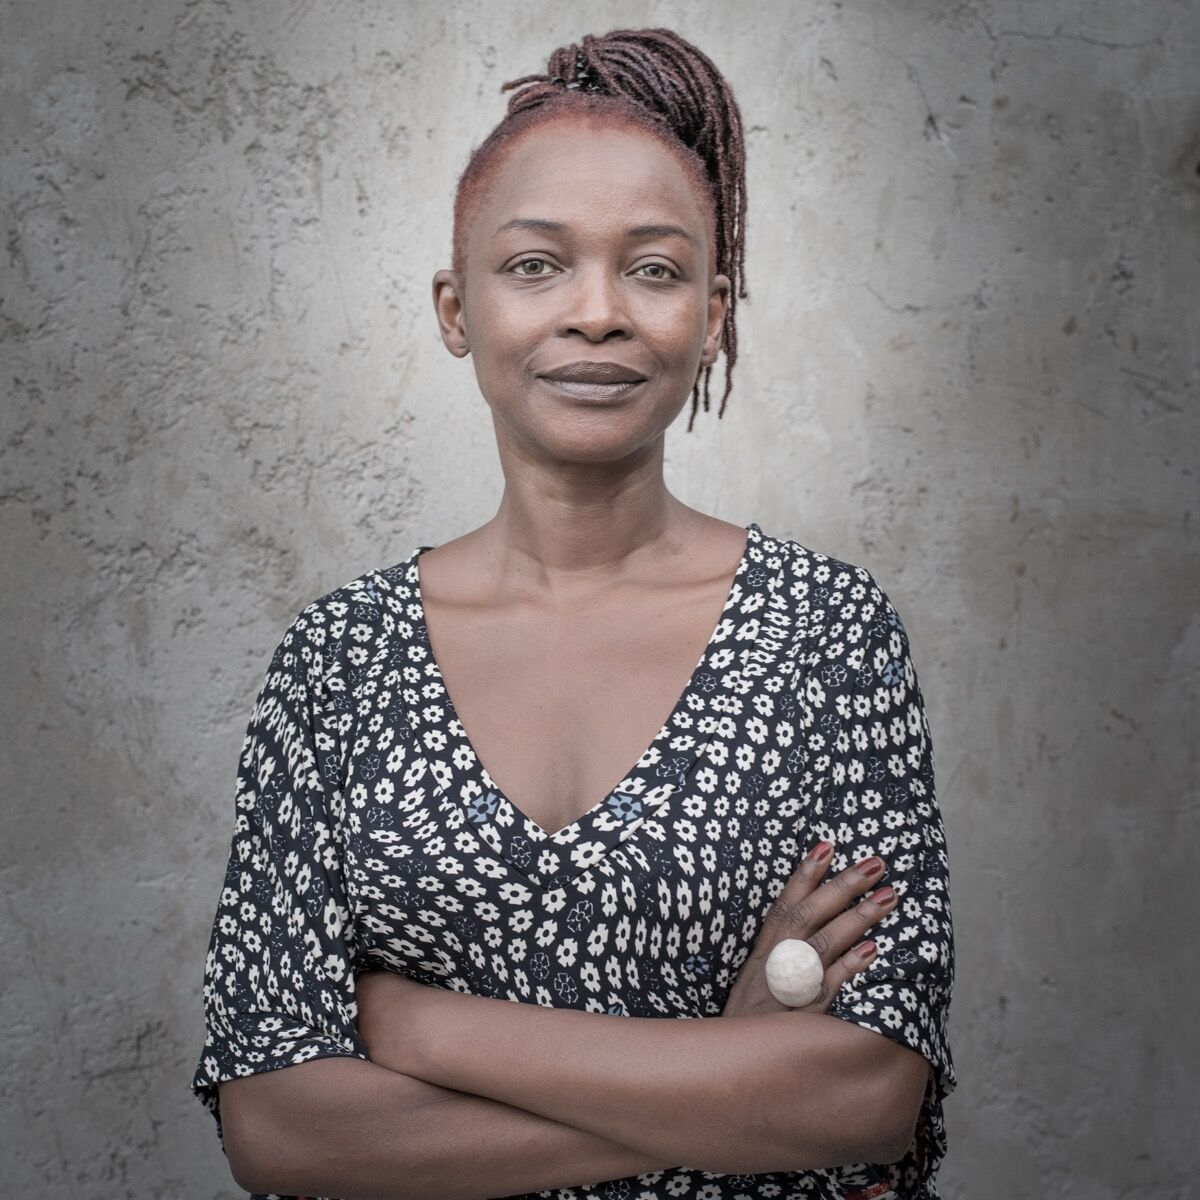 Portrait of Koyo Kouoh by Antoine Tempé. Courtesy of RAW Material Company, Dakar Senegal.